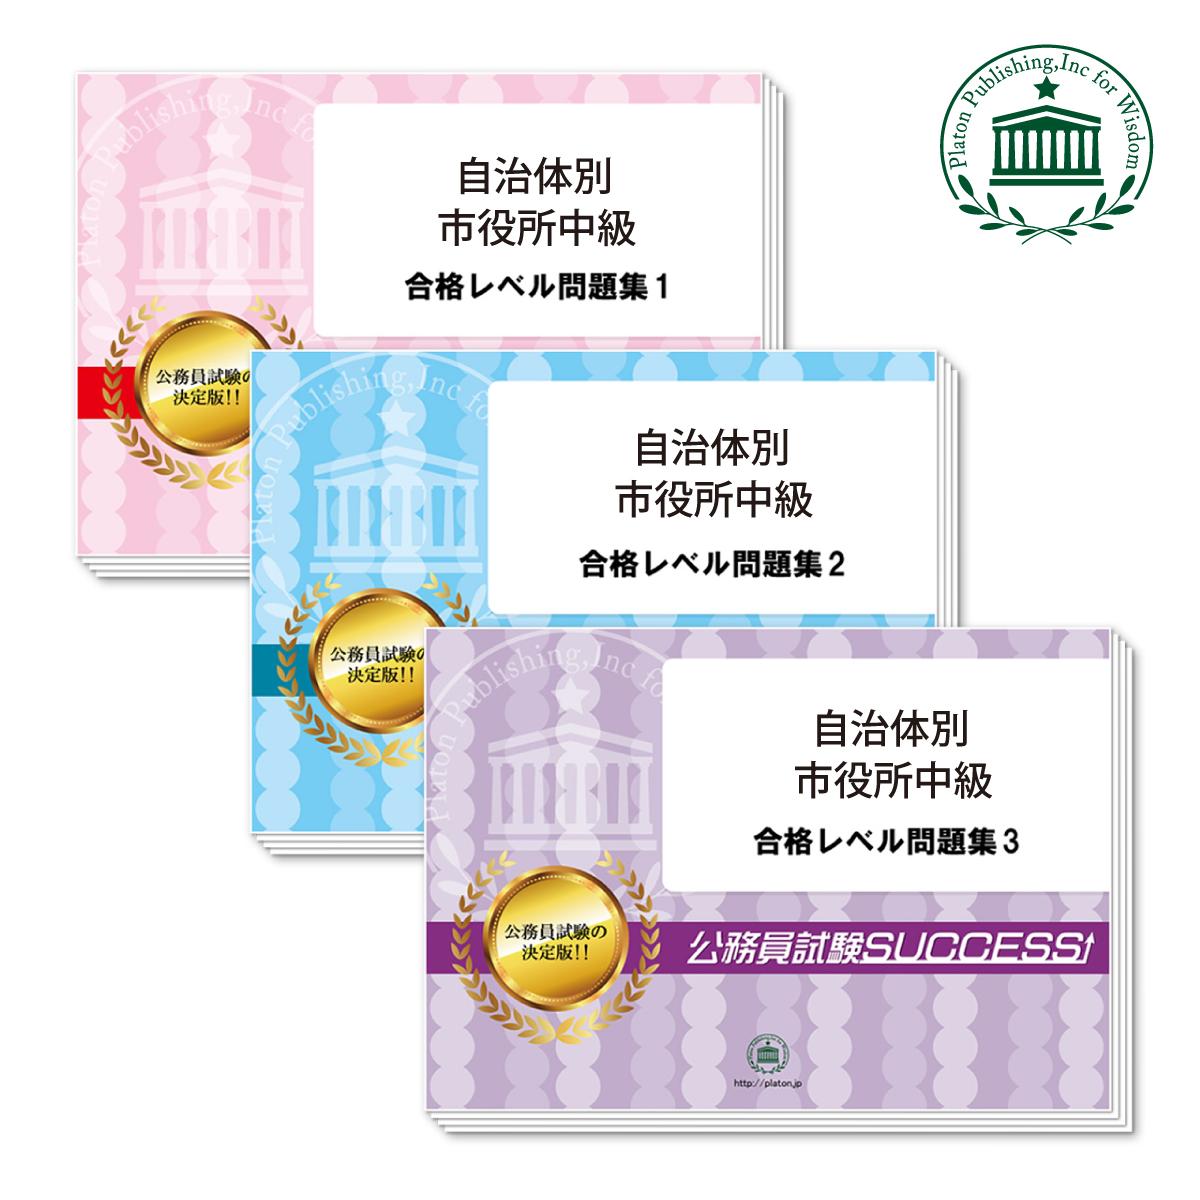 送料 ストアー 代引手数料無料 お中元 昭島市職員採用 3冊 教養試験合格セット 2類